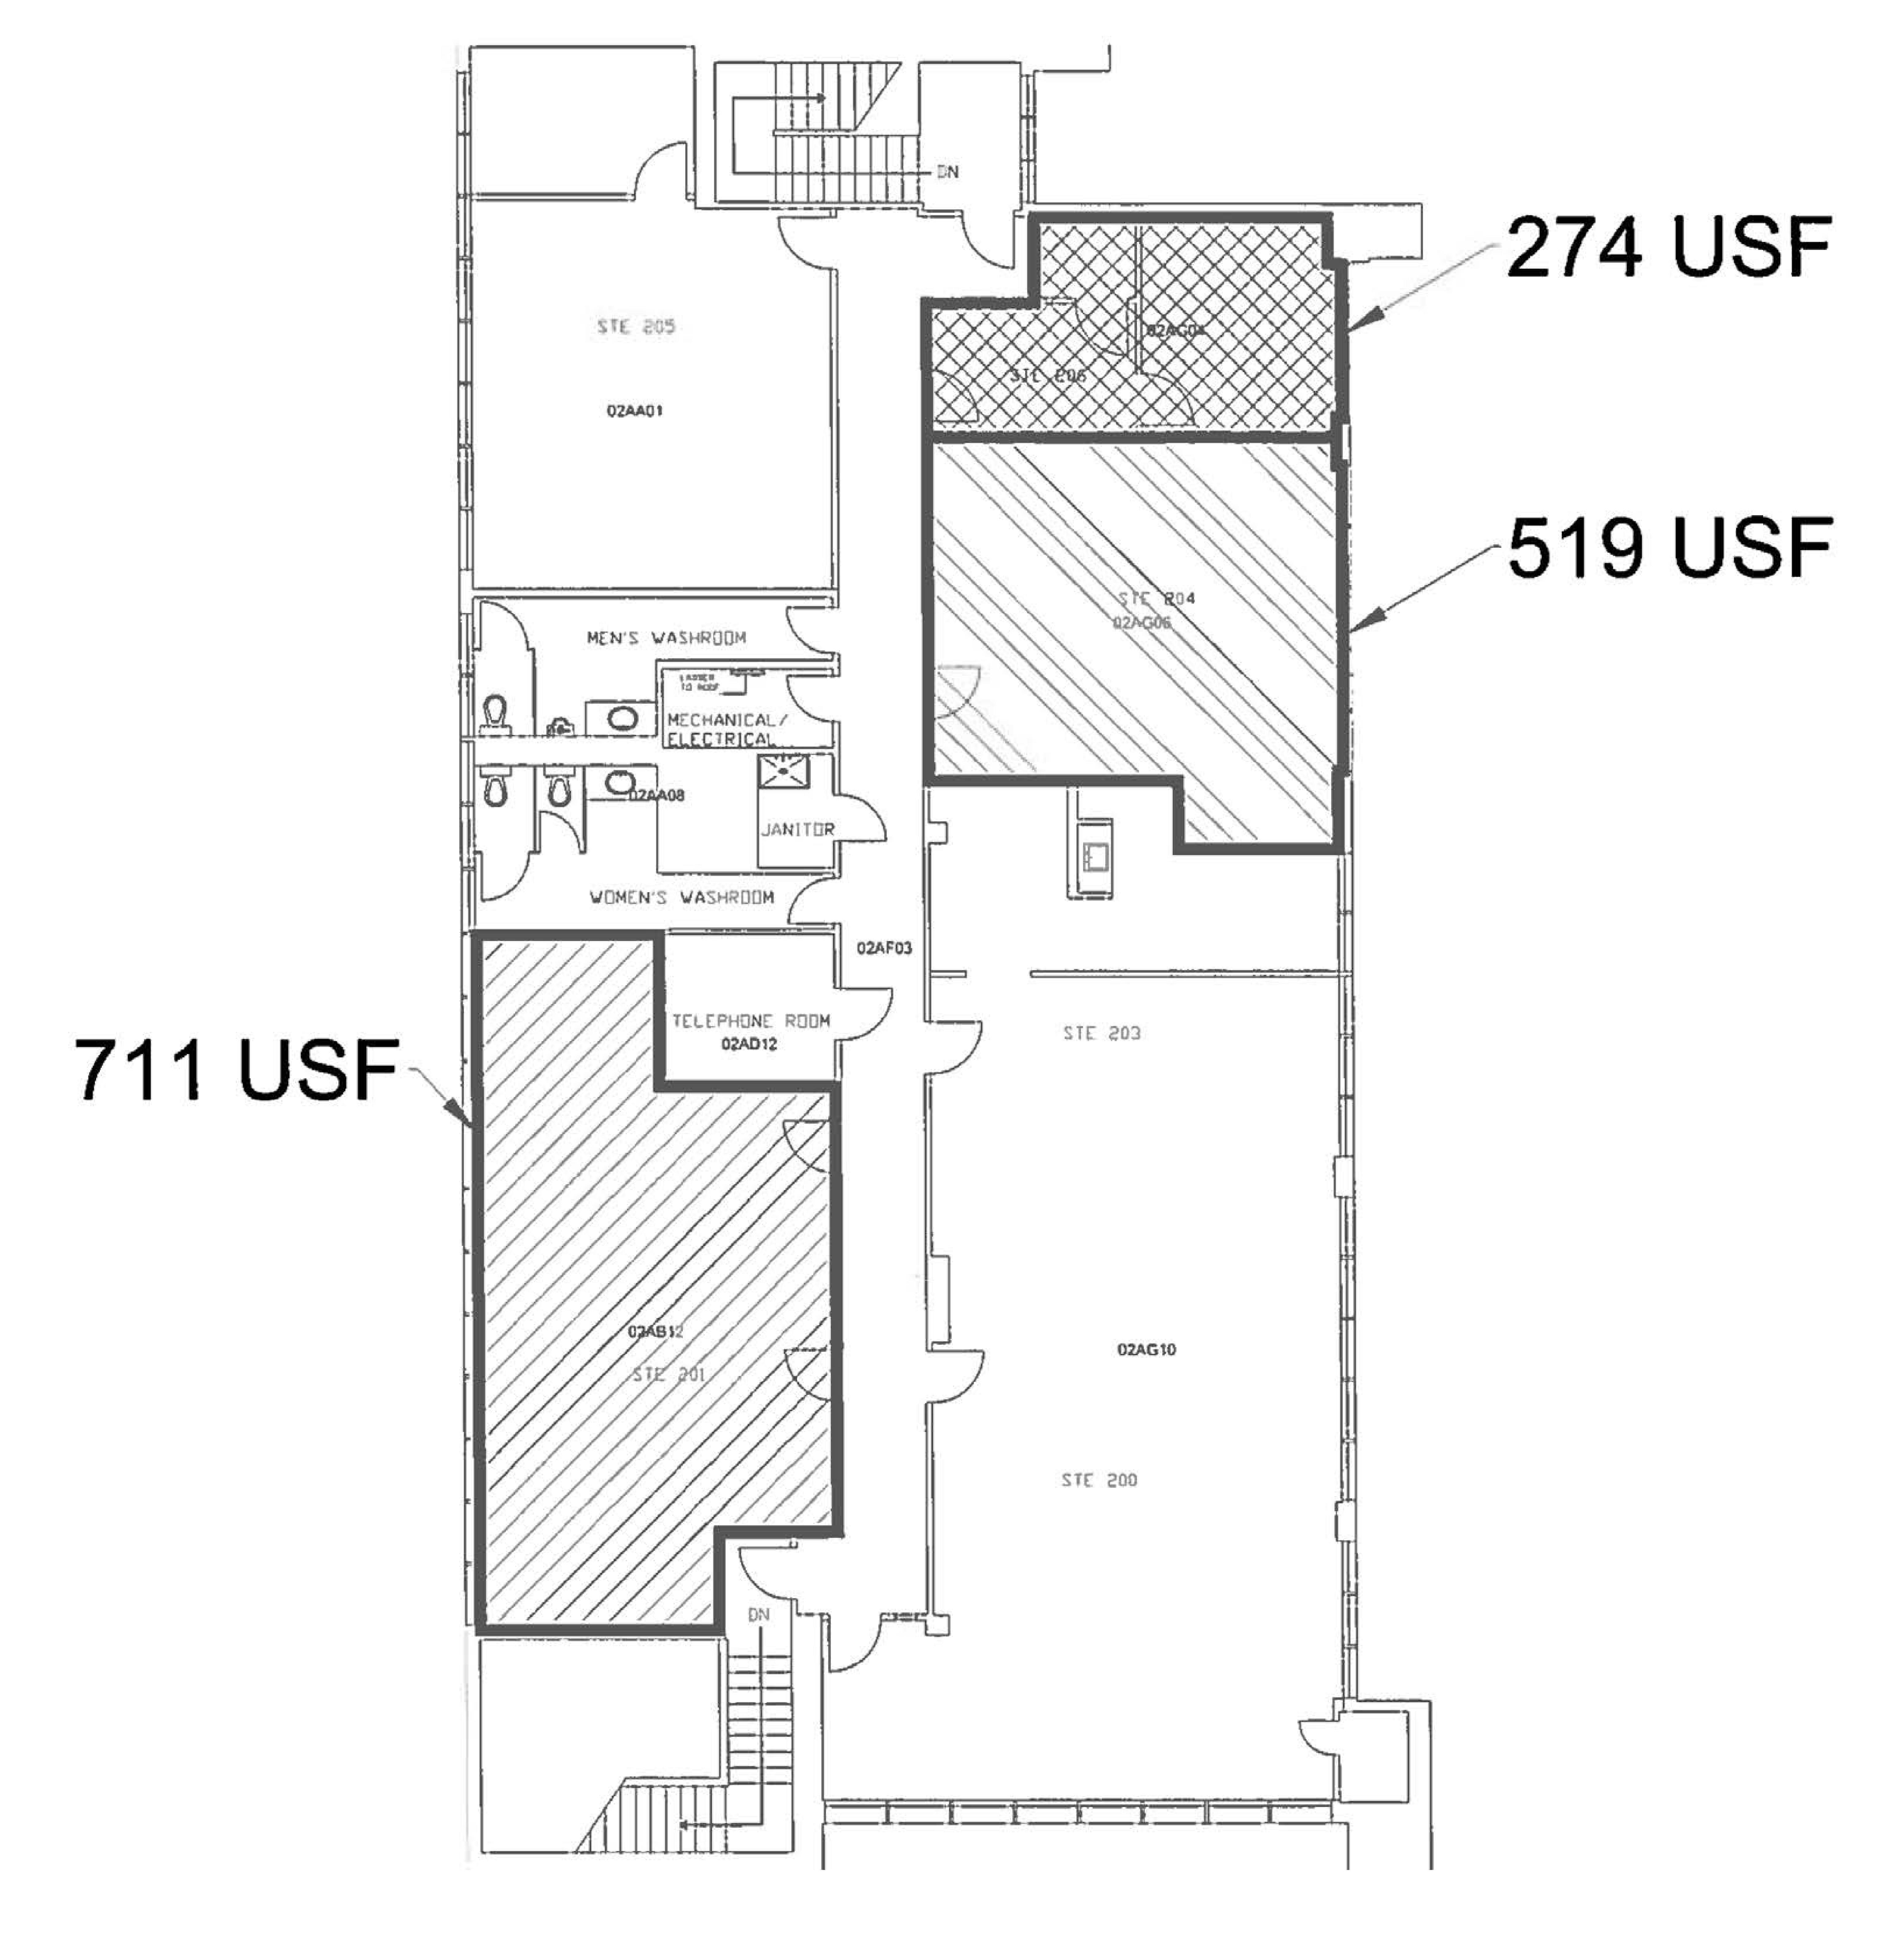 3431 Hwy 66: site plan